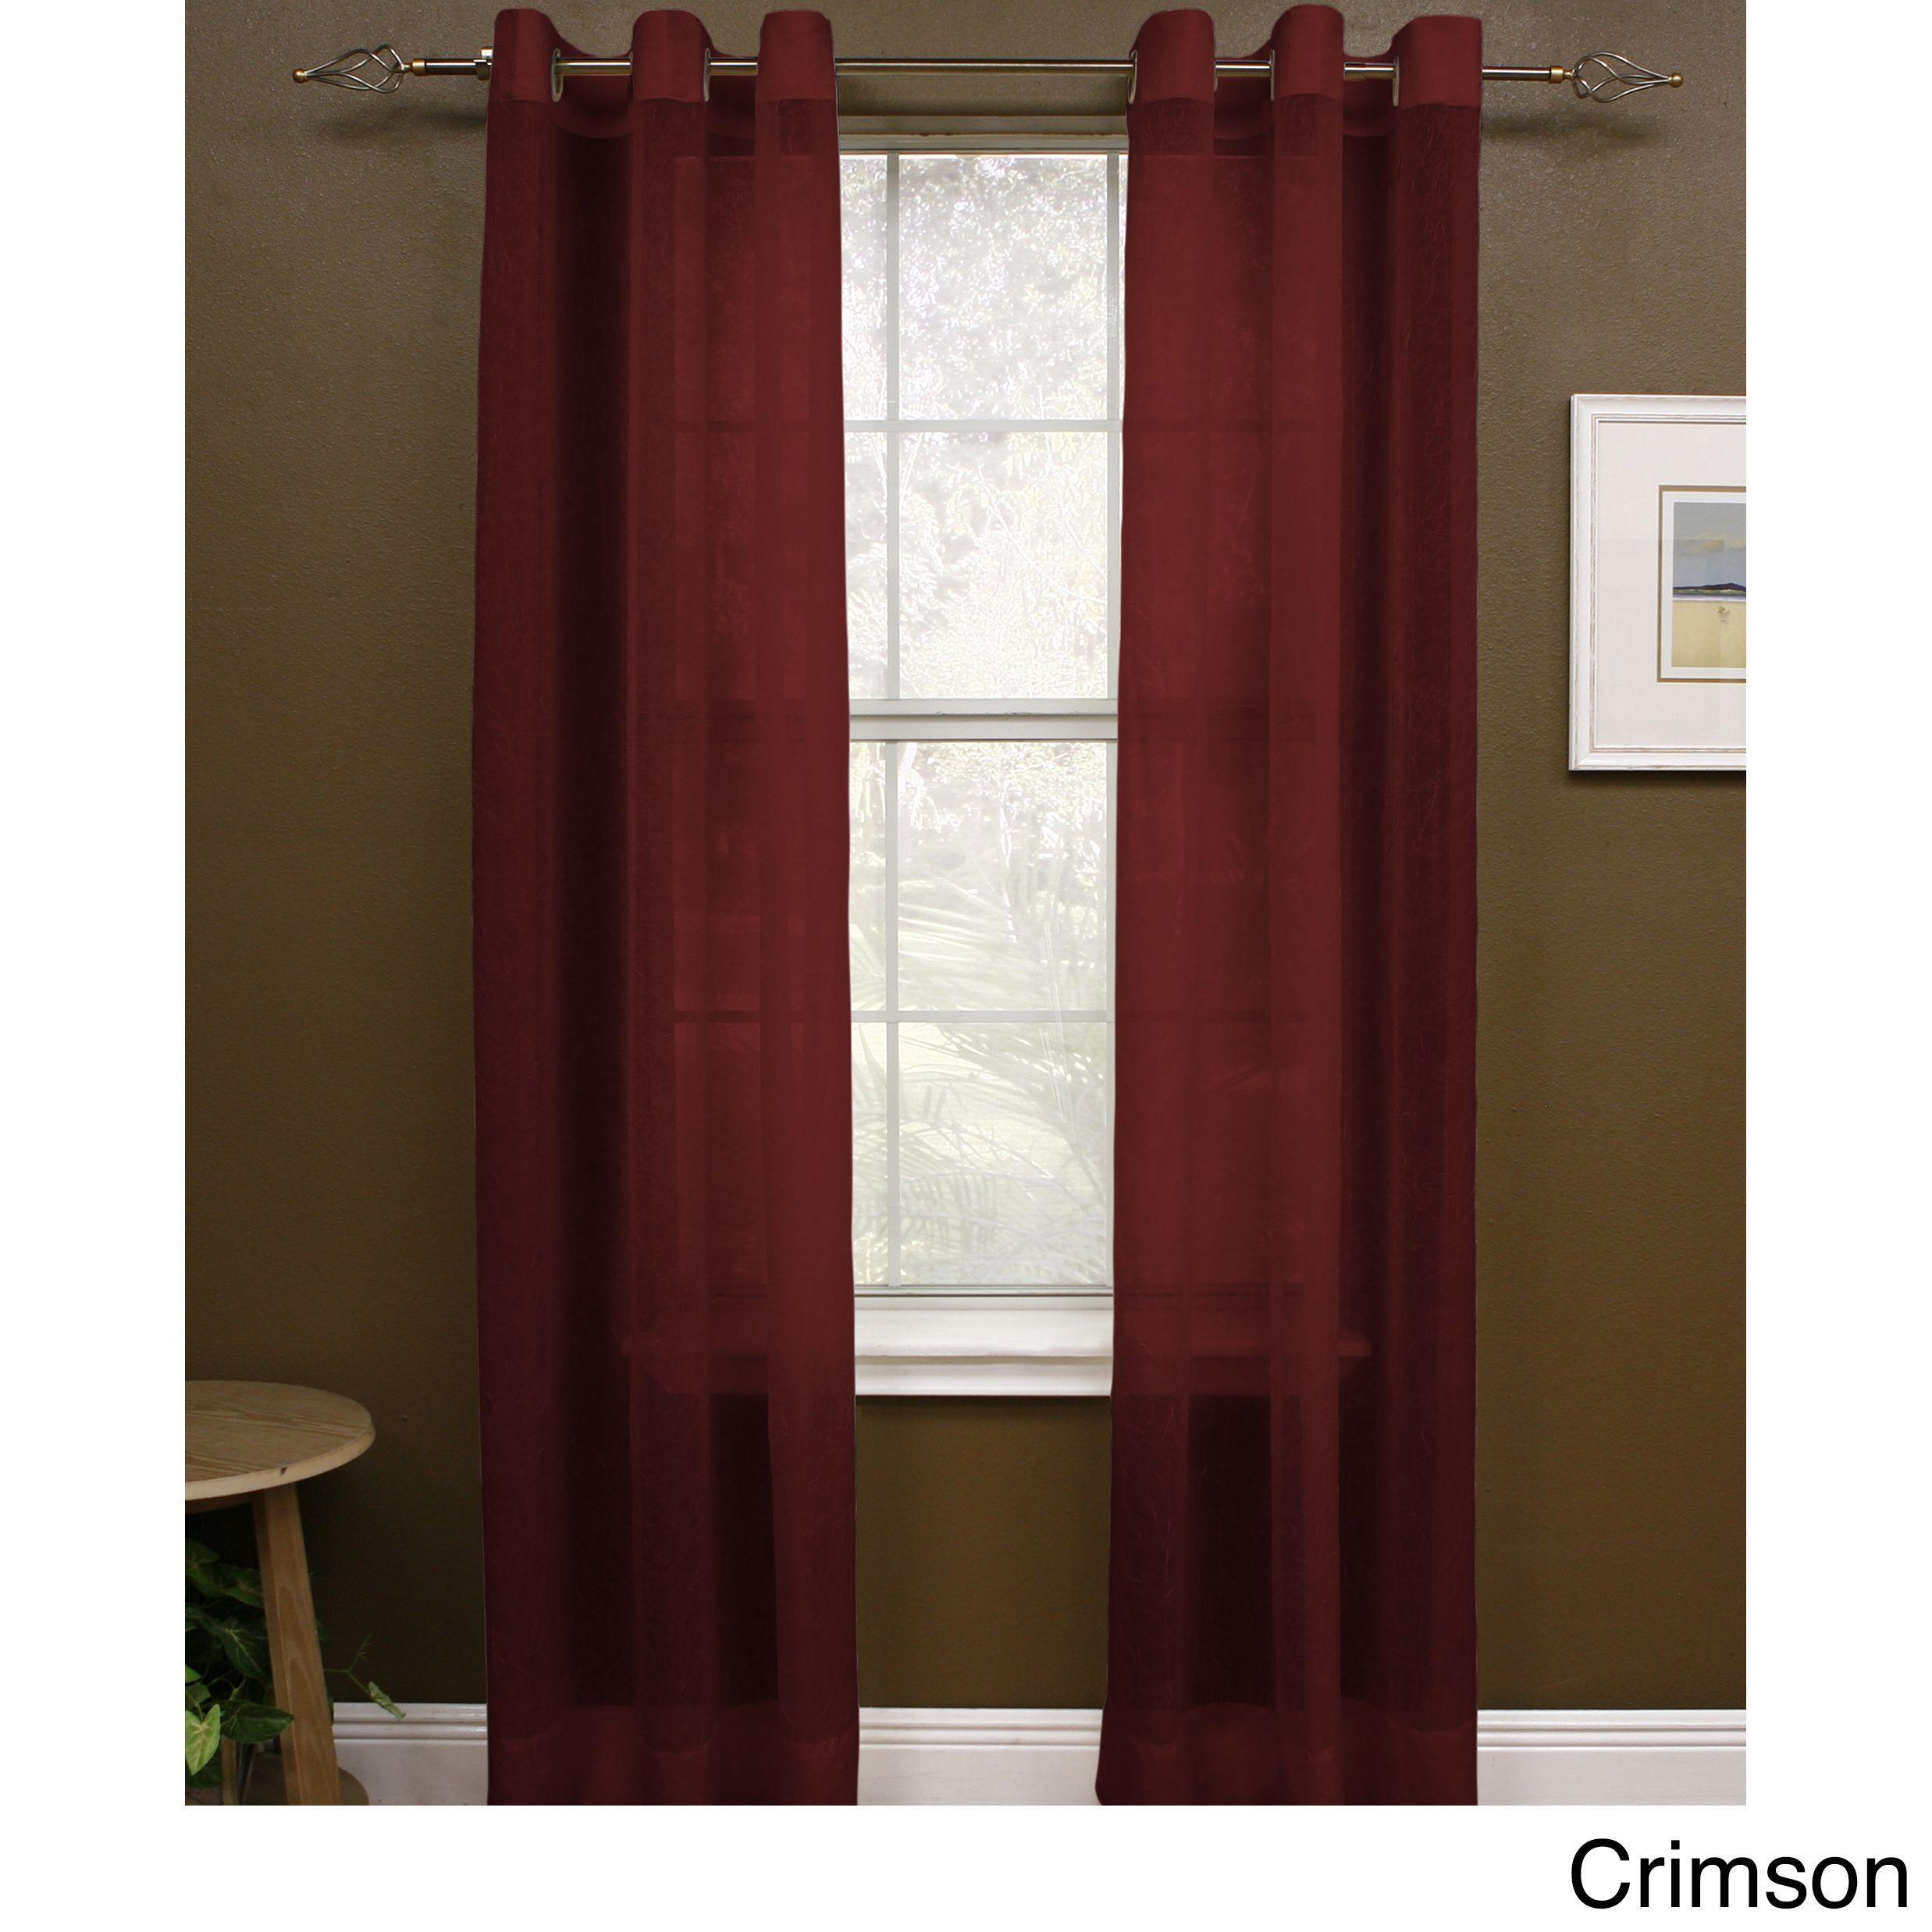 pocket sheer millennial home marine b treatments the window laguna n lichtenberg drapes rod no curtains panel curtain depot